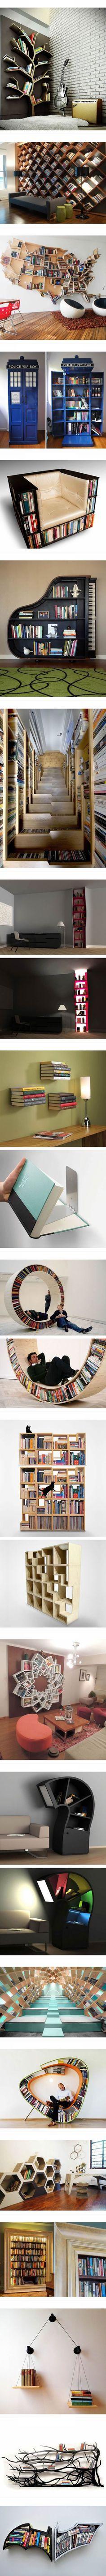 Bookselves ideas